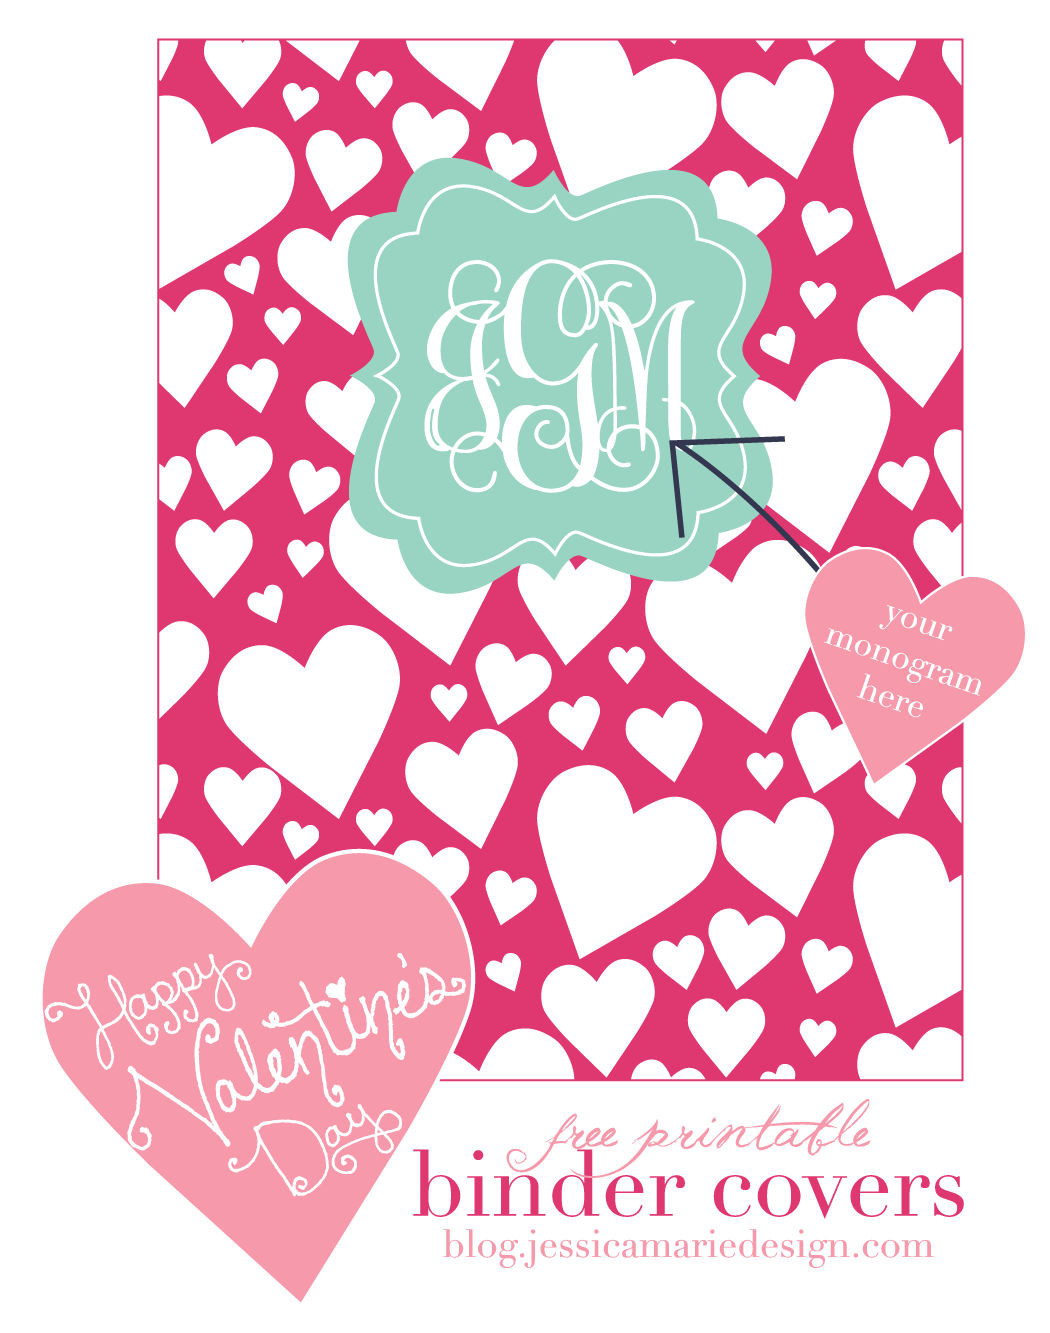 Jessica Marie Design Blog Free Printable Binder Covers